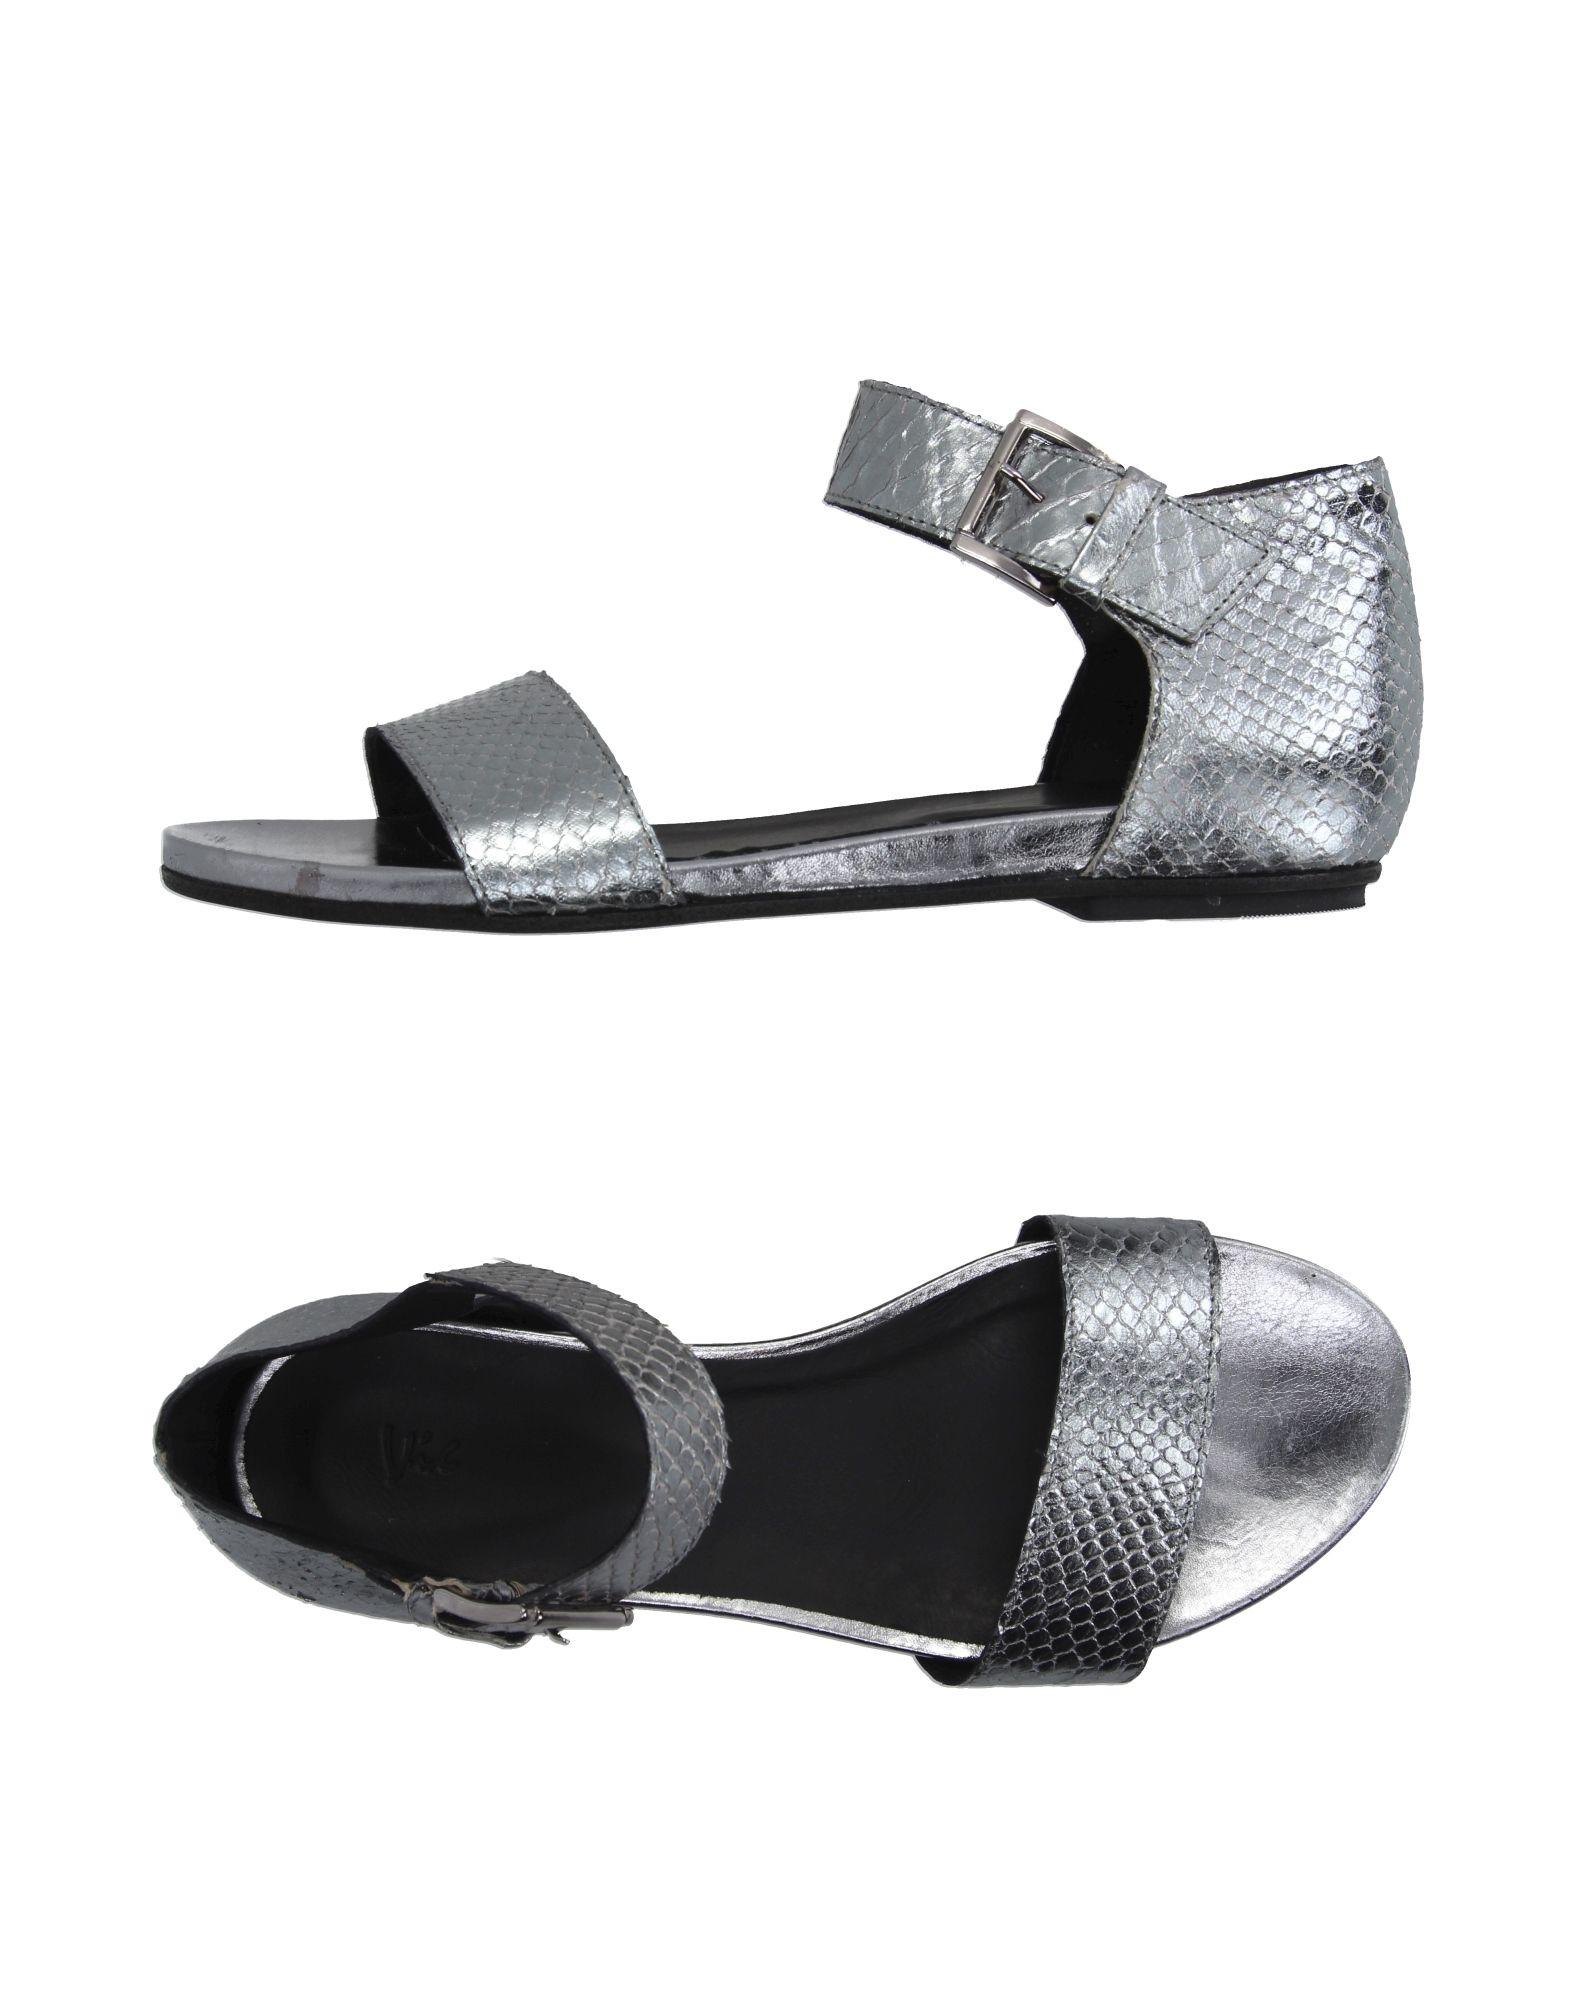 Vic Sandalen Damen  11004313LM Gute Qualität beliebte Schuhe